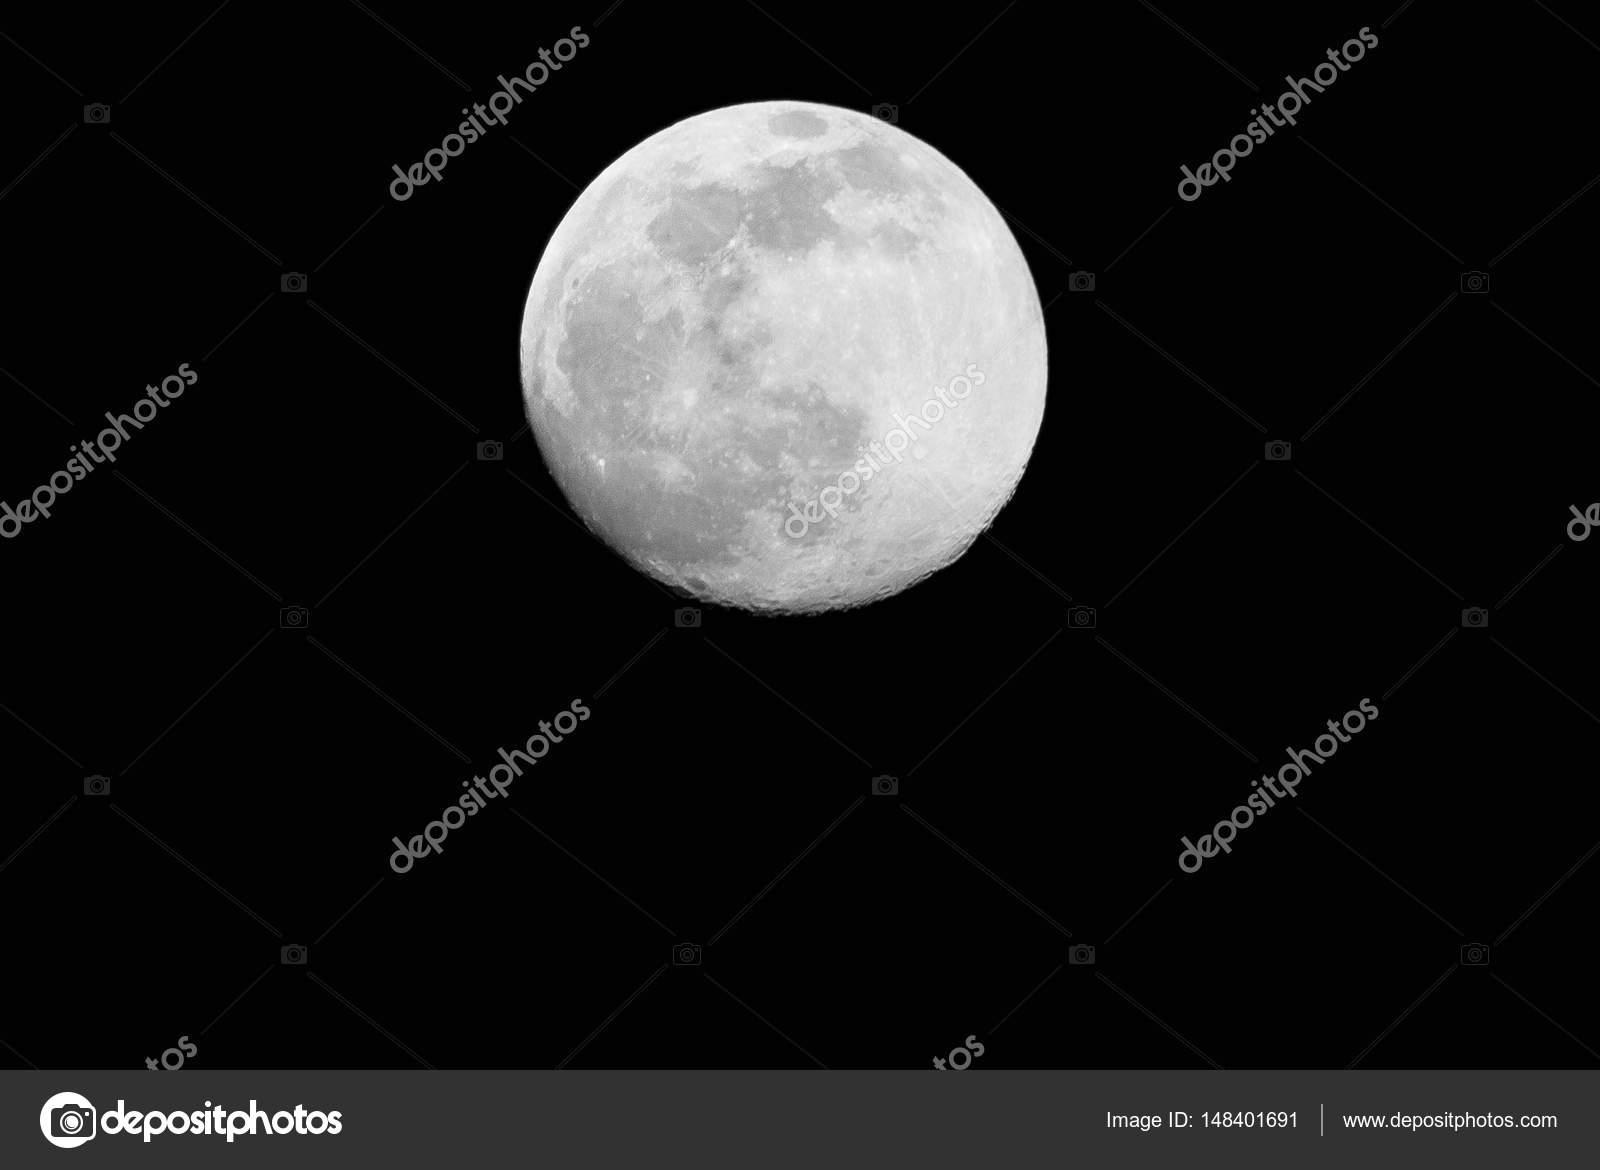 Super Moon On Black Background Stock Photo C Kruchamp1987 148401691